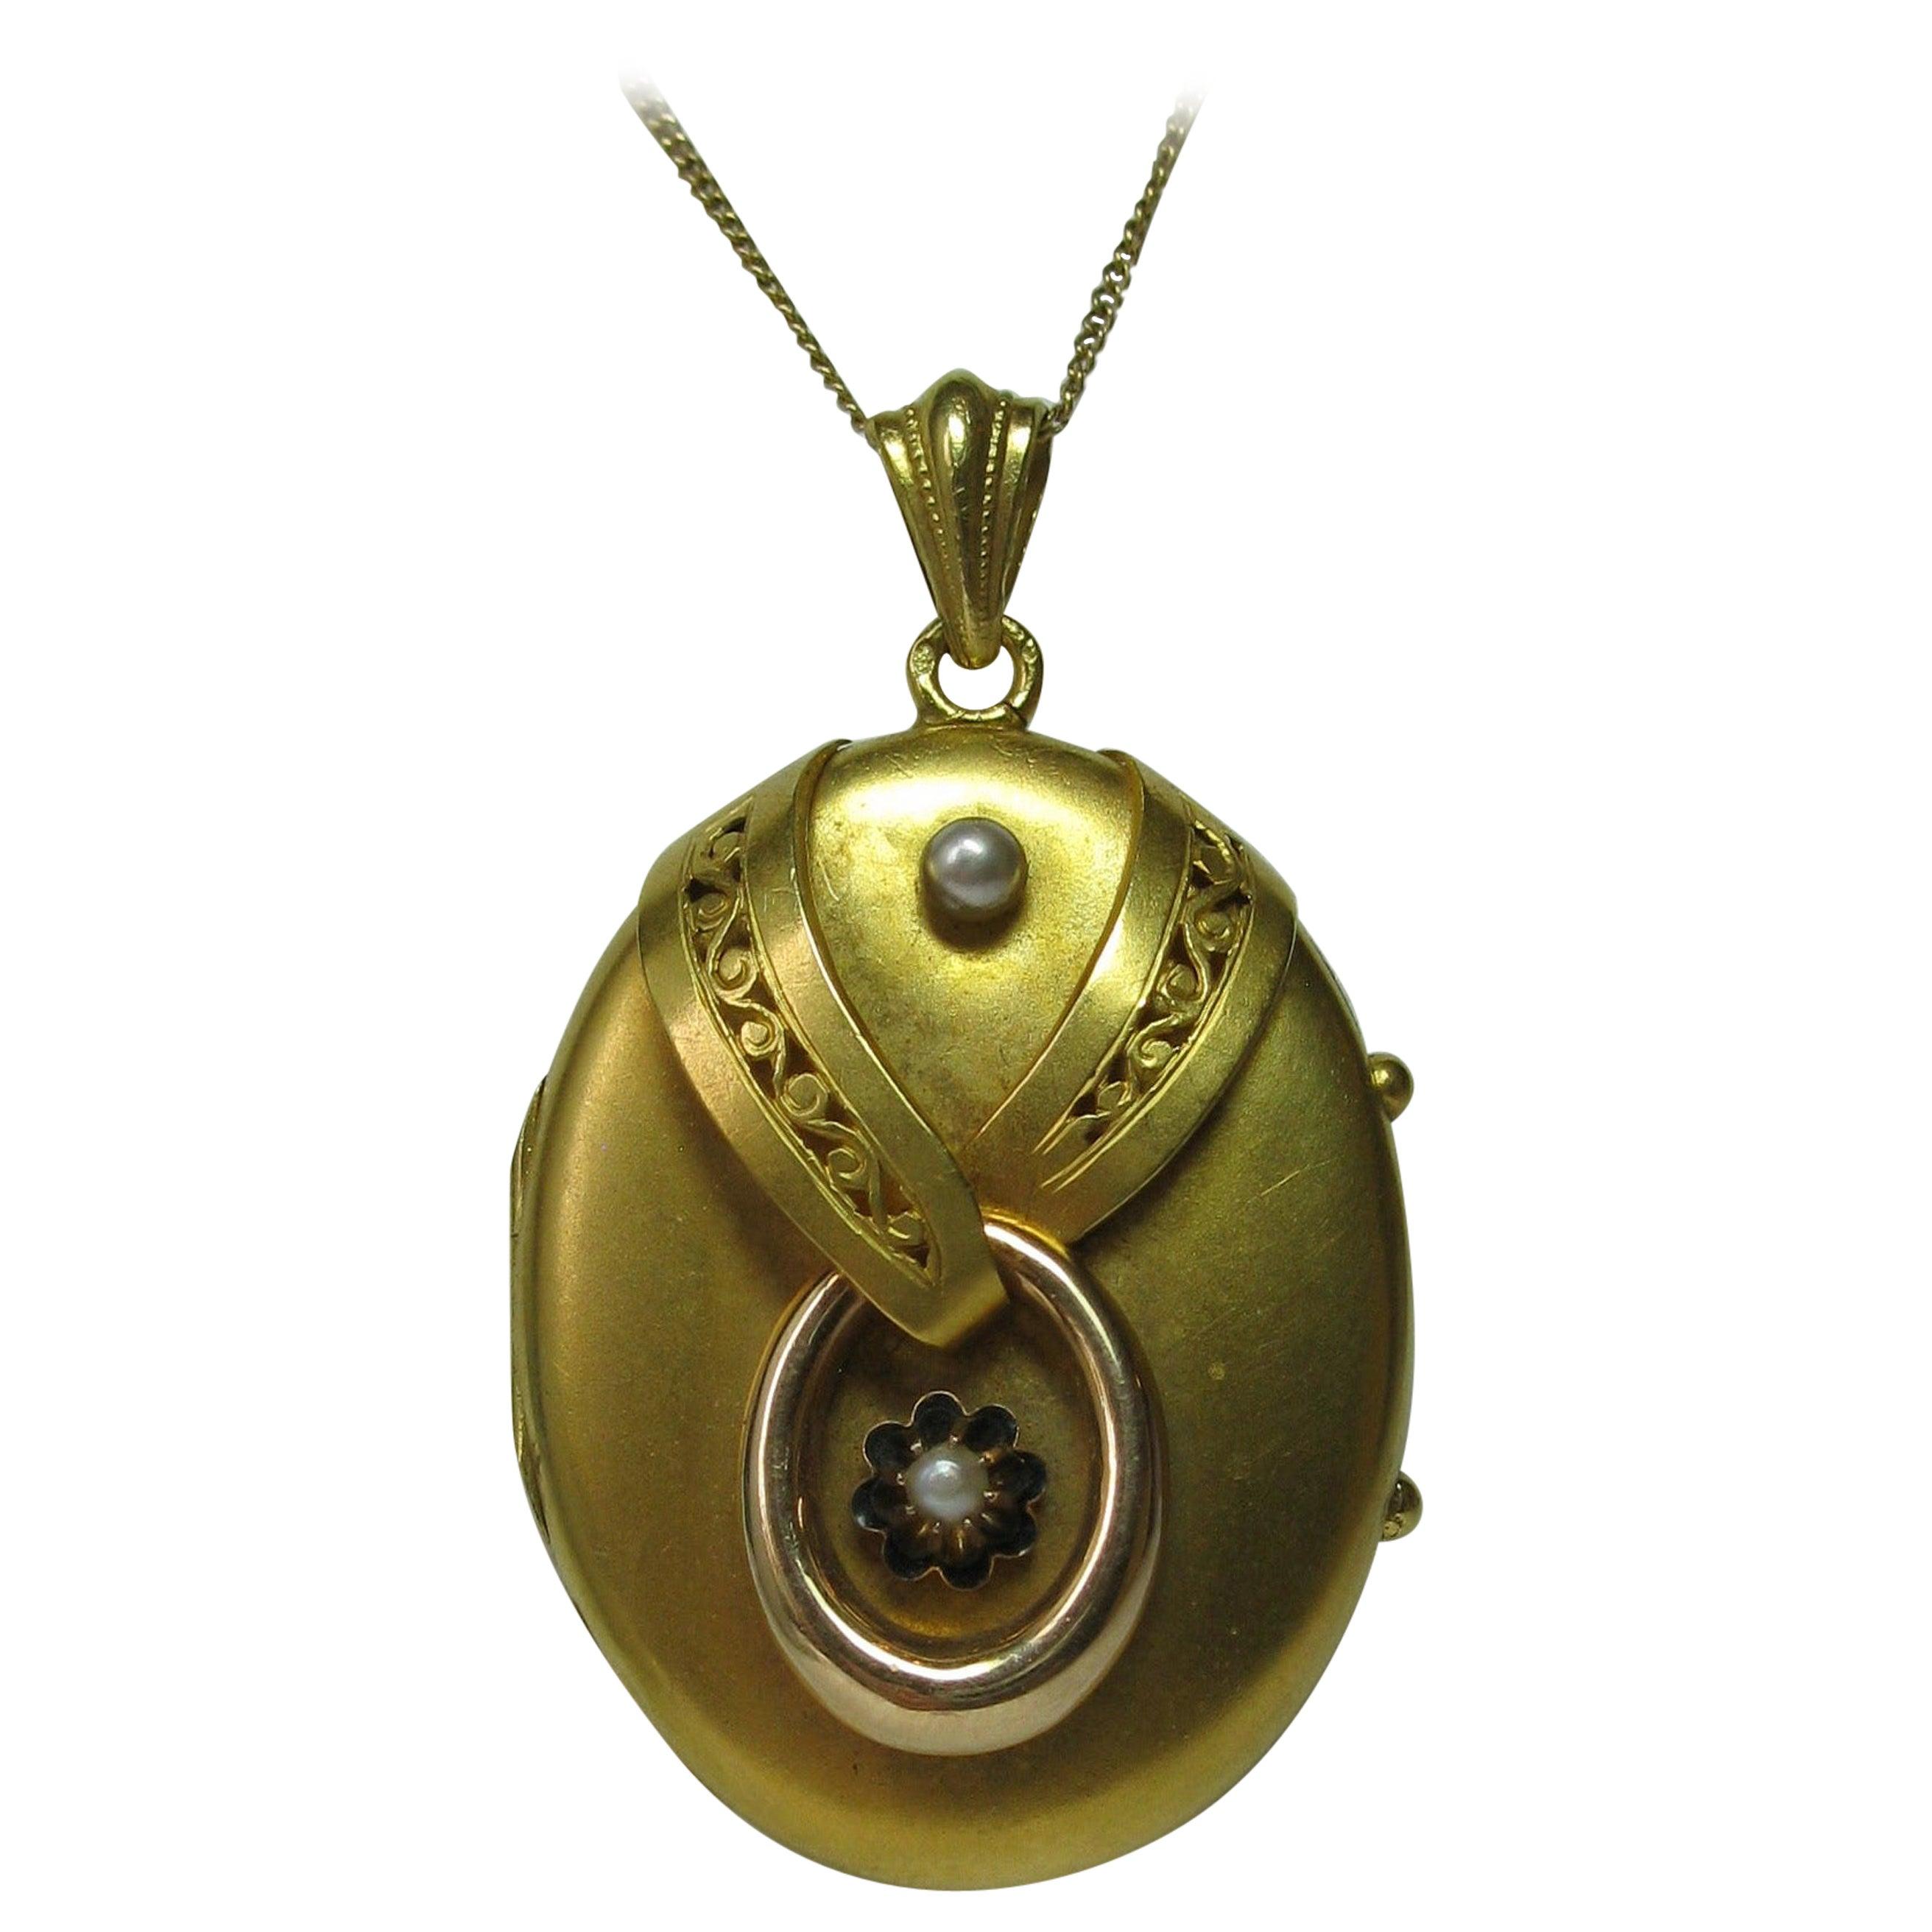 Antique Victorian Gold Locket 16 Karat Etruscan Pearl, circa 1860